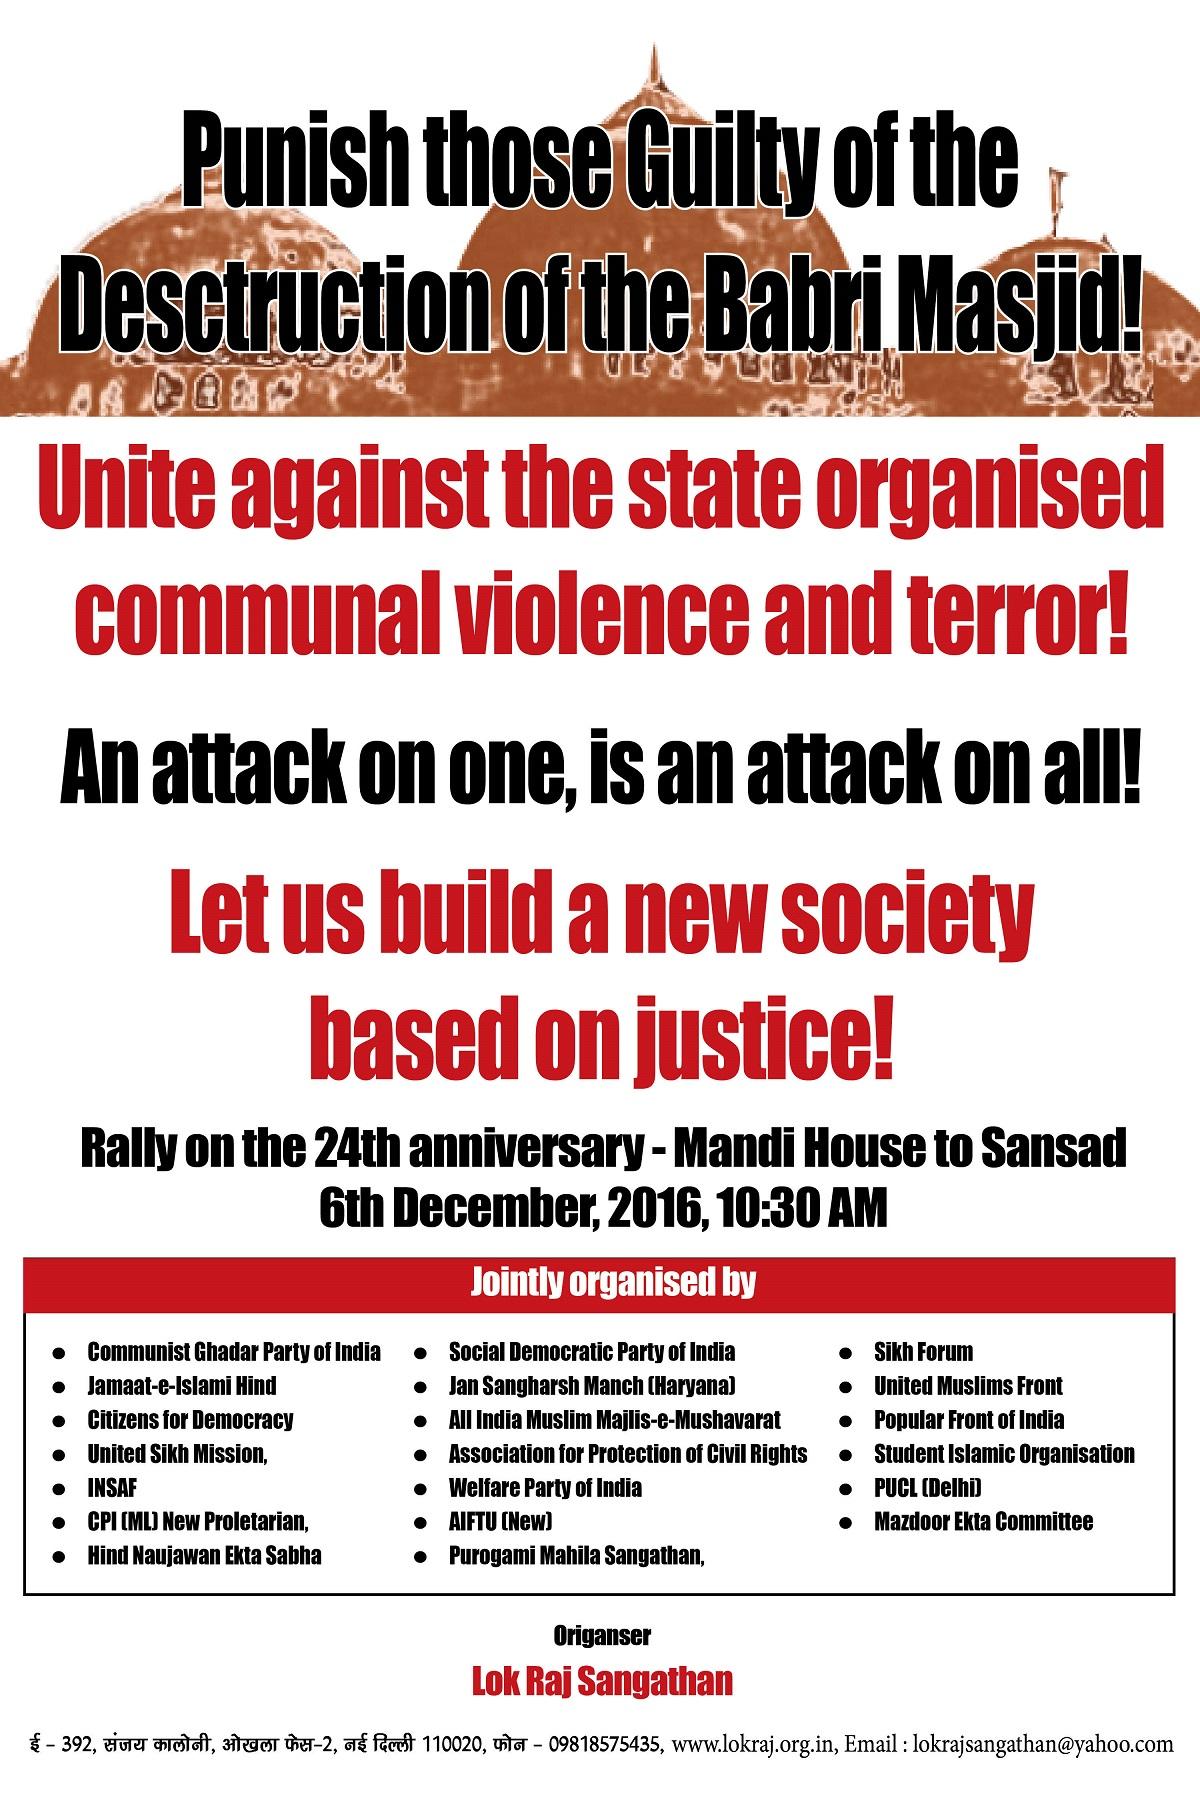 6 Dec rally 2016-English poster